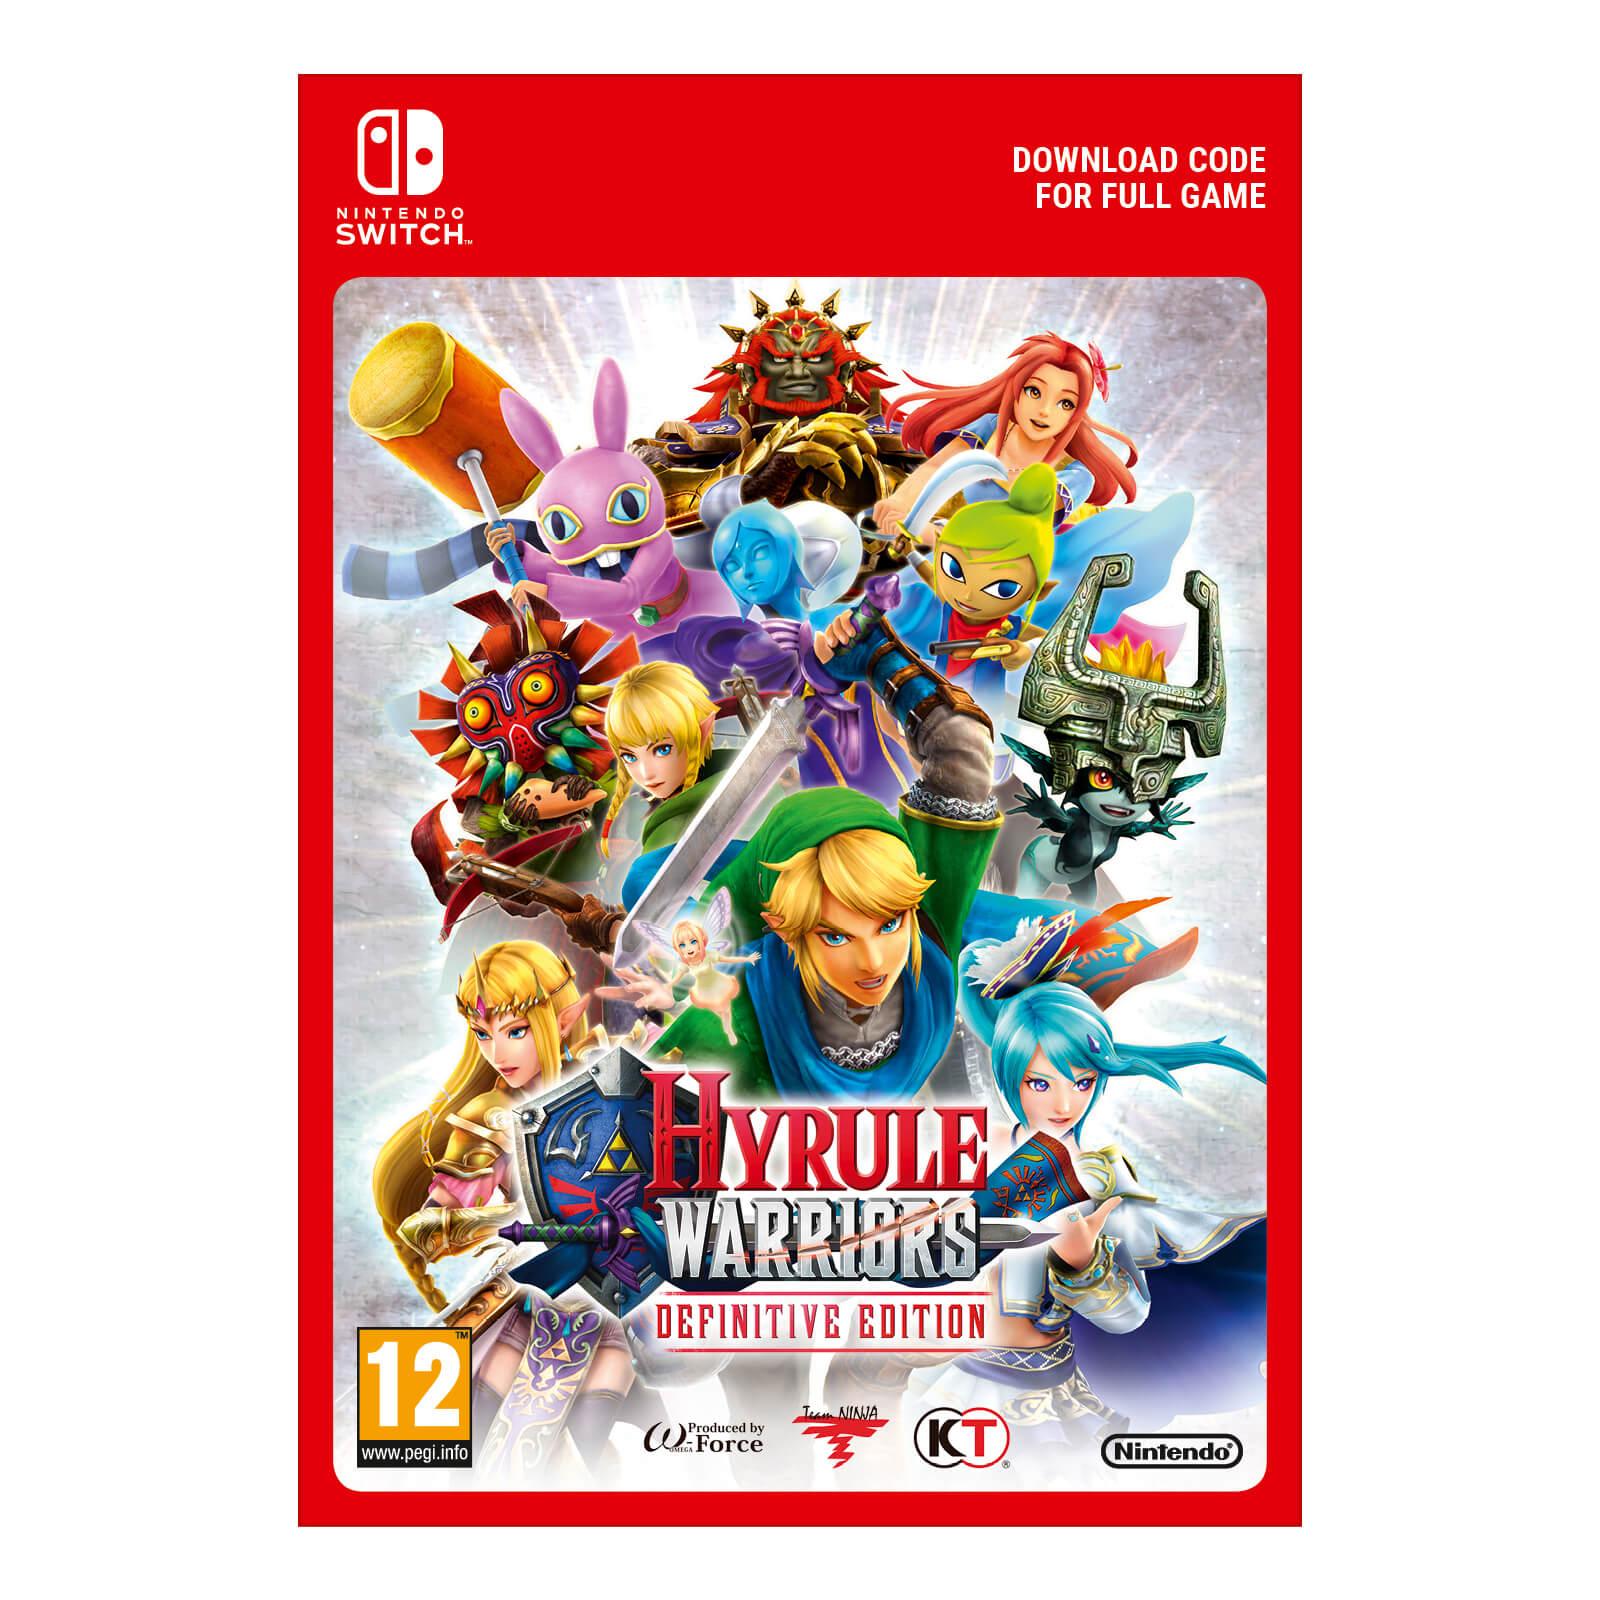 Hyrule Warriors Definitive Edition Digital Download Nintendo Official Uk Store